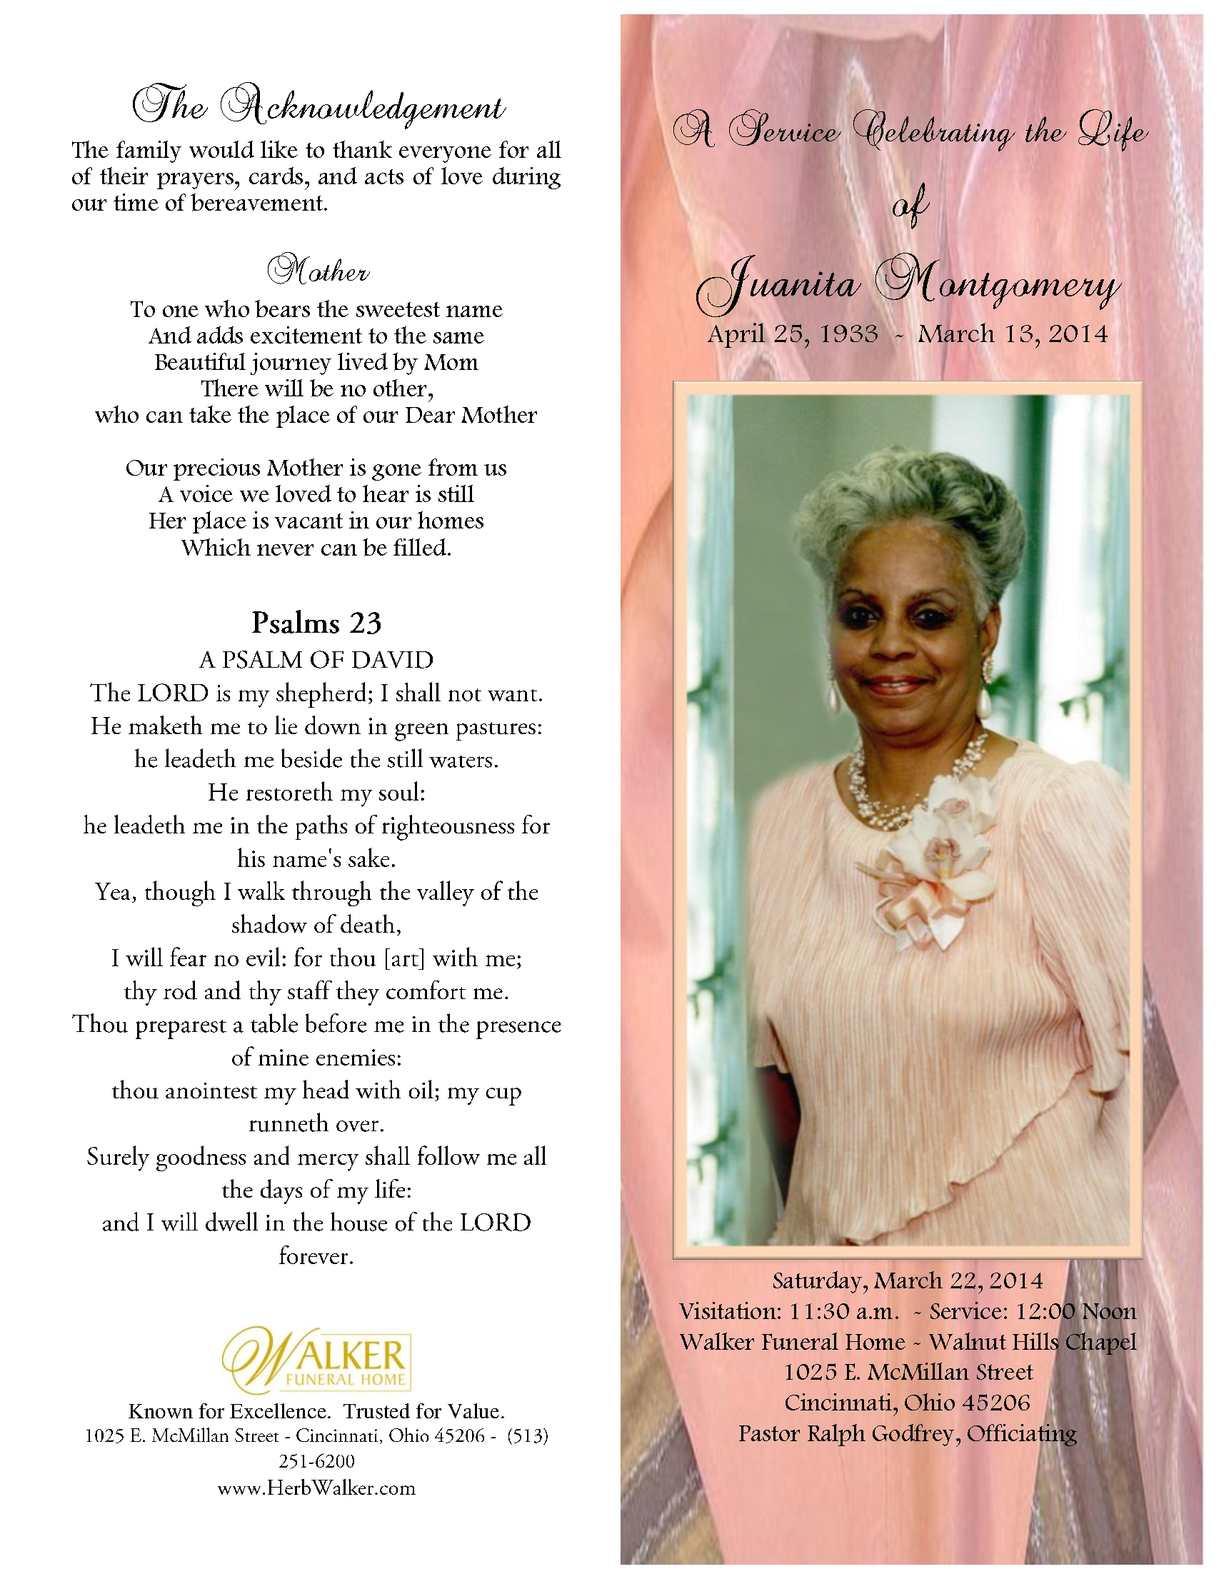 Walker Funeral Home Cincinnati Ohio Obituaries